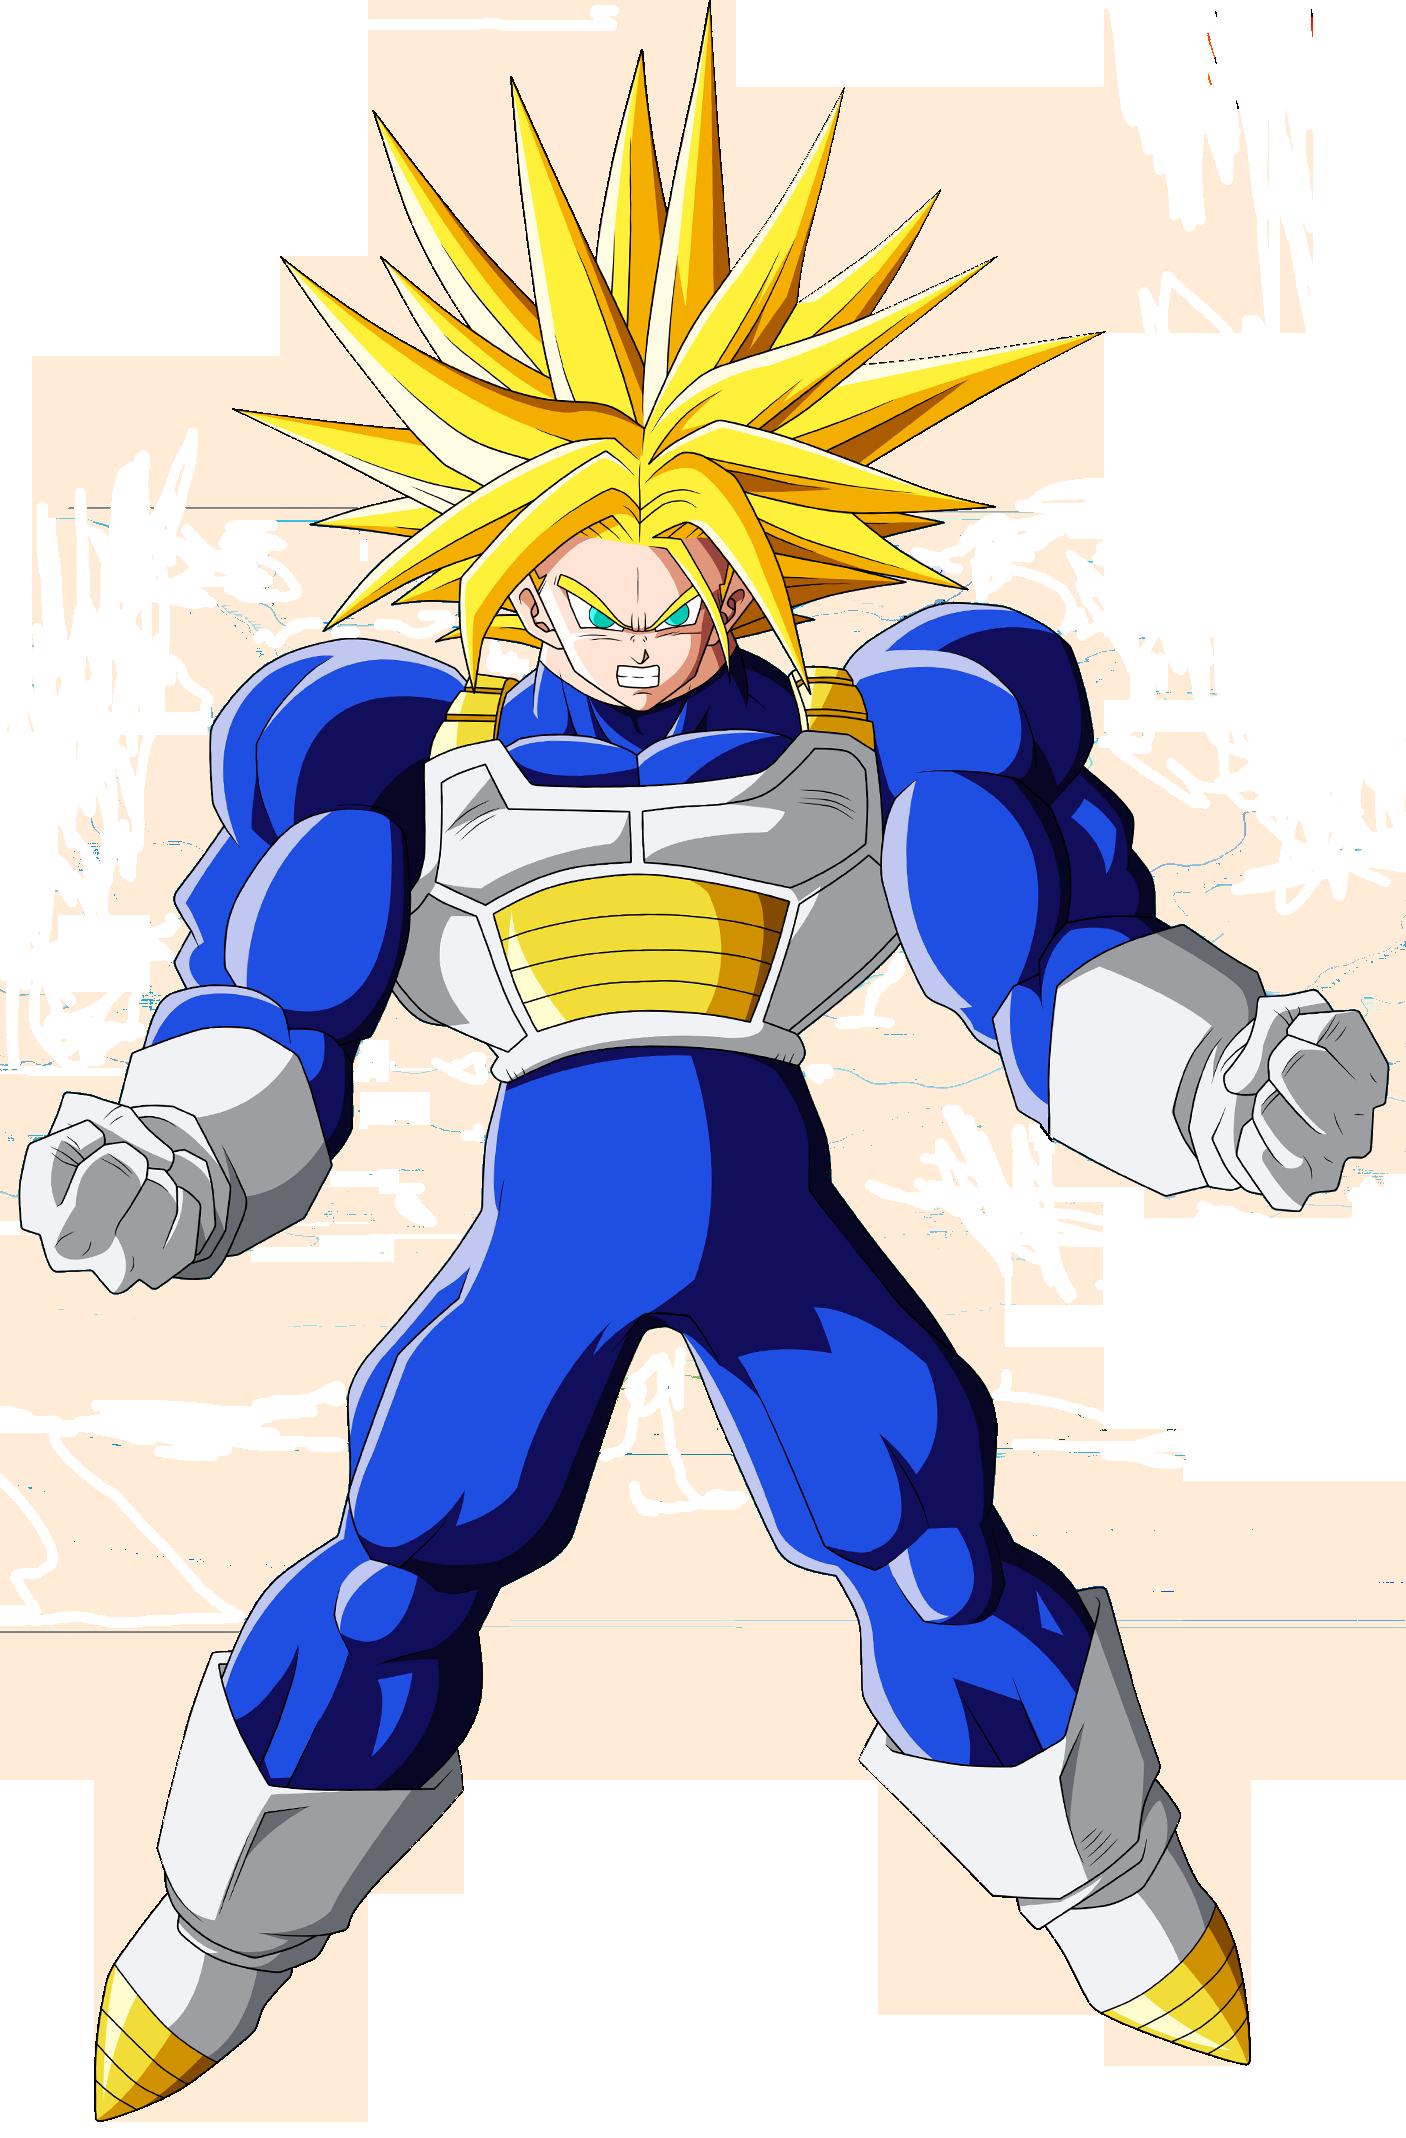 Trunks del futuro alternativo t cnicas y habilidades - San goku super saiyan 5 ...